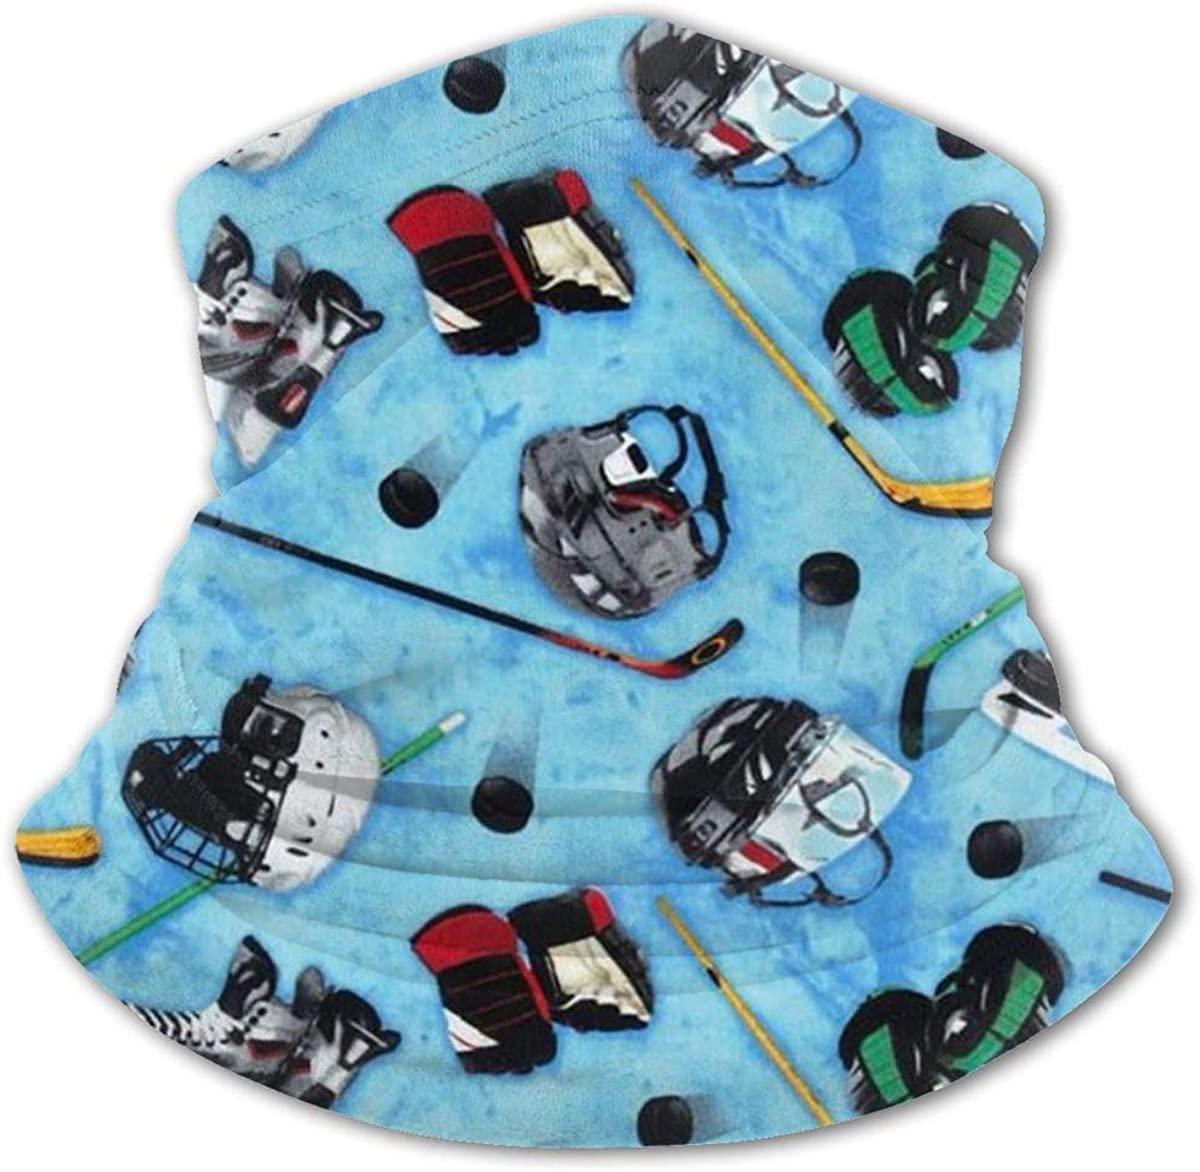 Hockey Equipment Headwear For Girls And Boys, Head Wrap, Neck Gaiter, Headband, Tenn Fishing Mask, Magic Scarf, Tube Mask, Face Bandana Mask For Camping Running Cycling